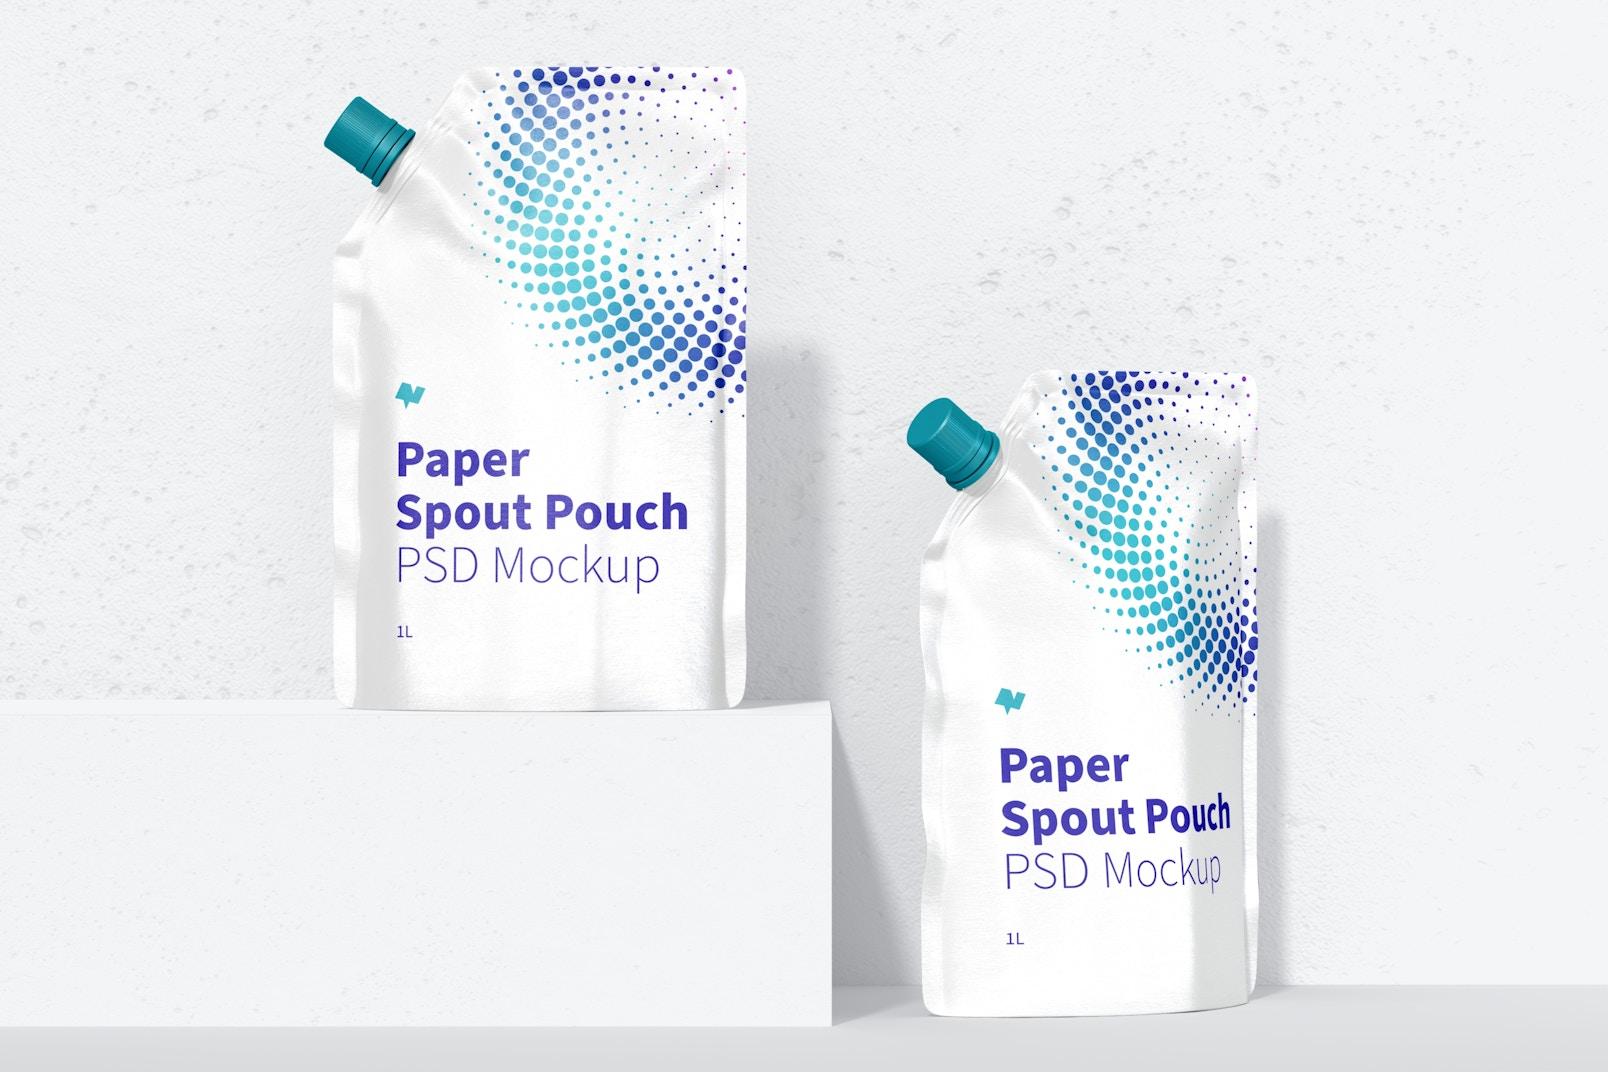 1 Liter Paper Spout Pouch Mockup, Front View